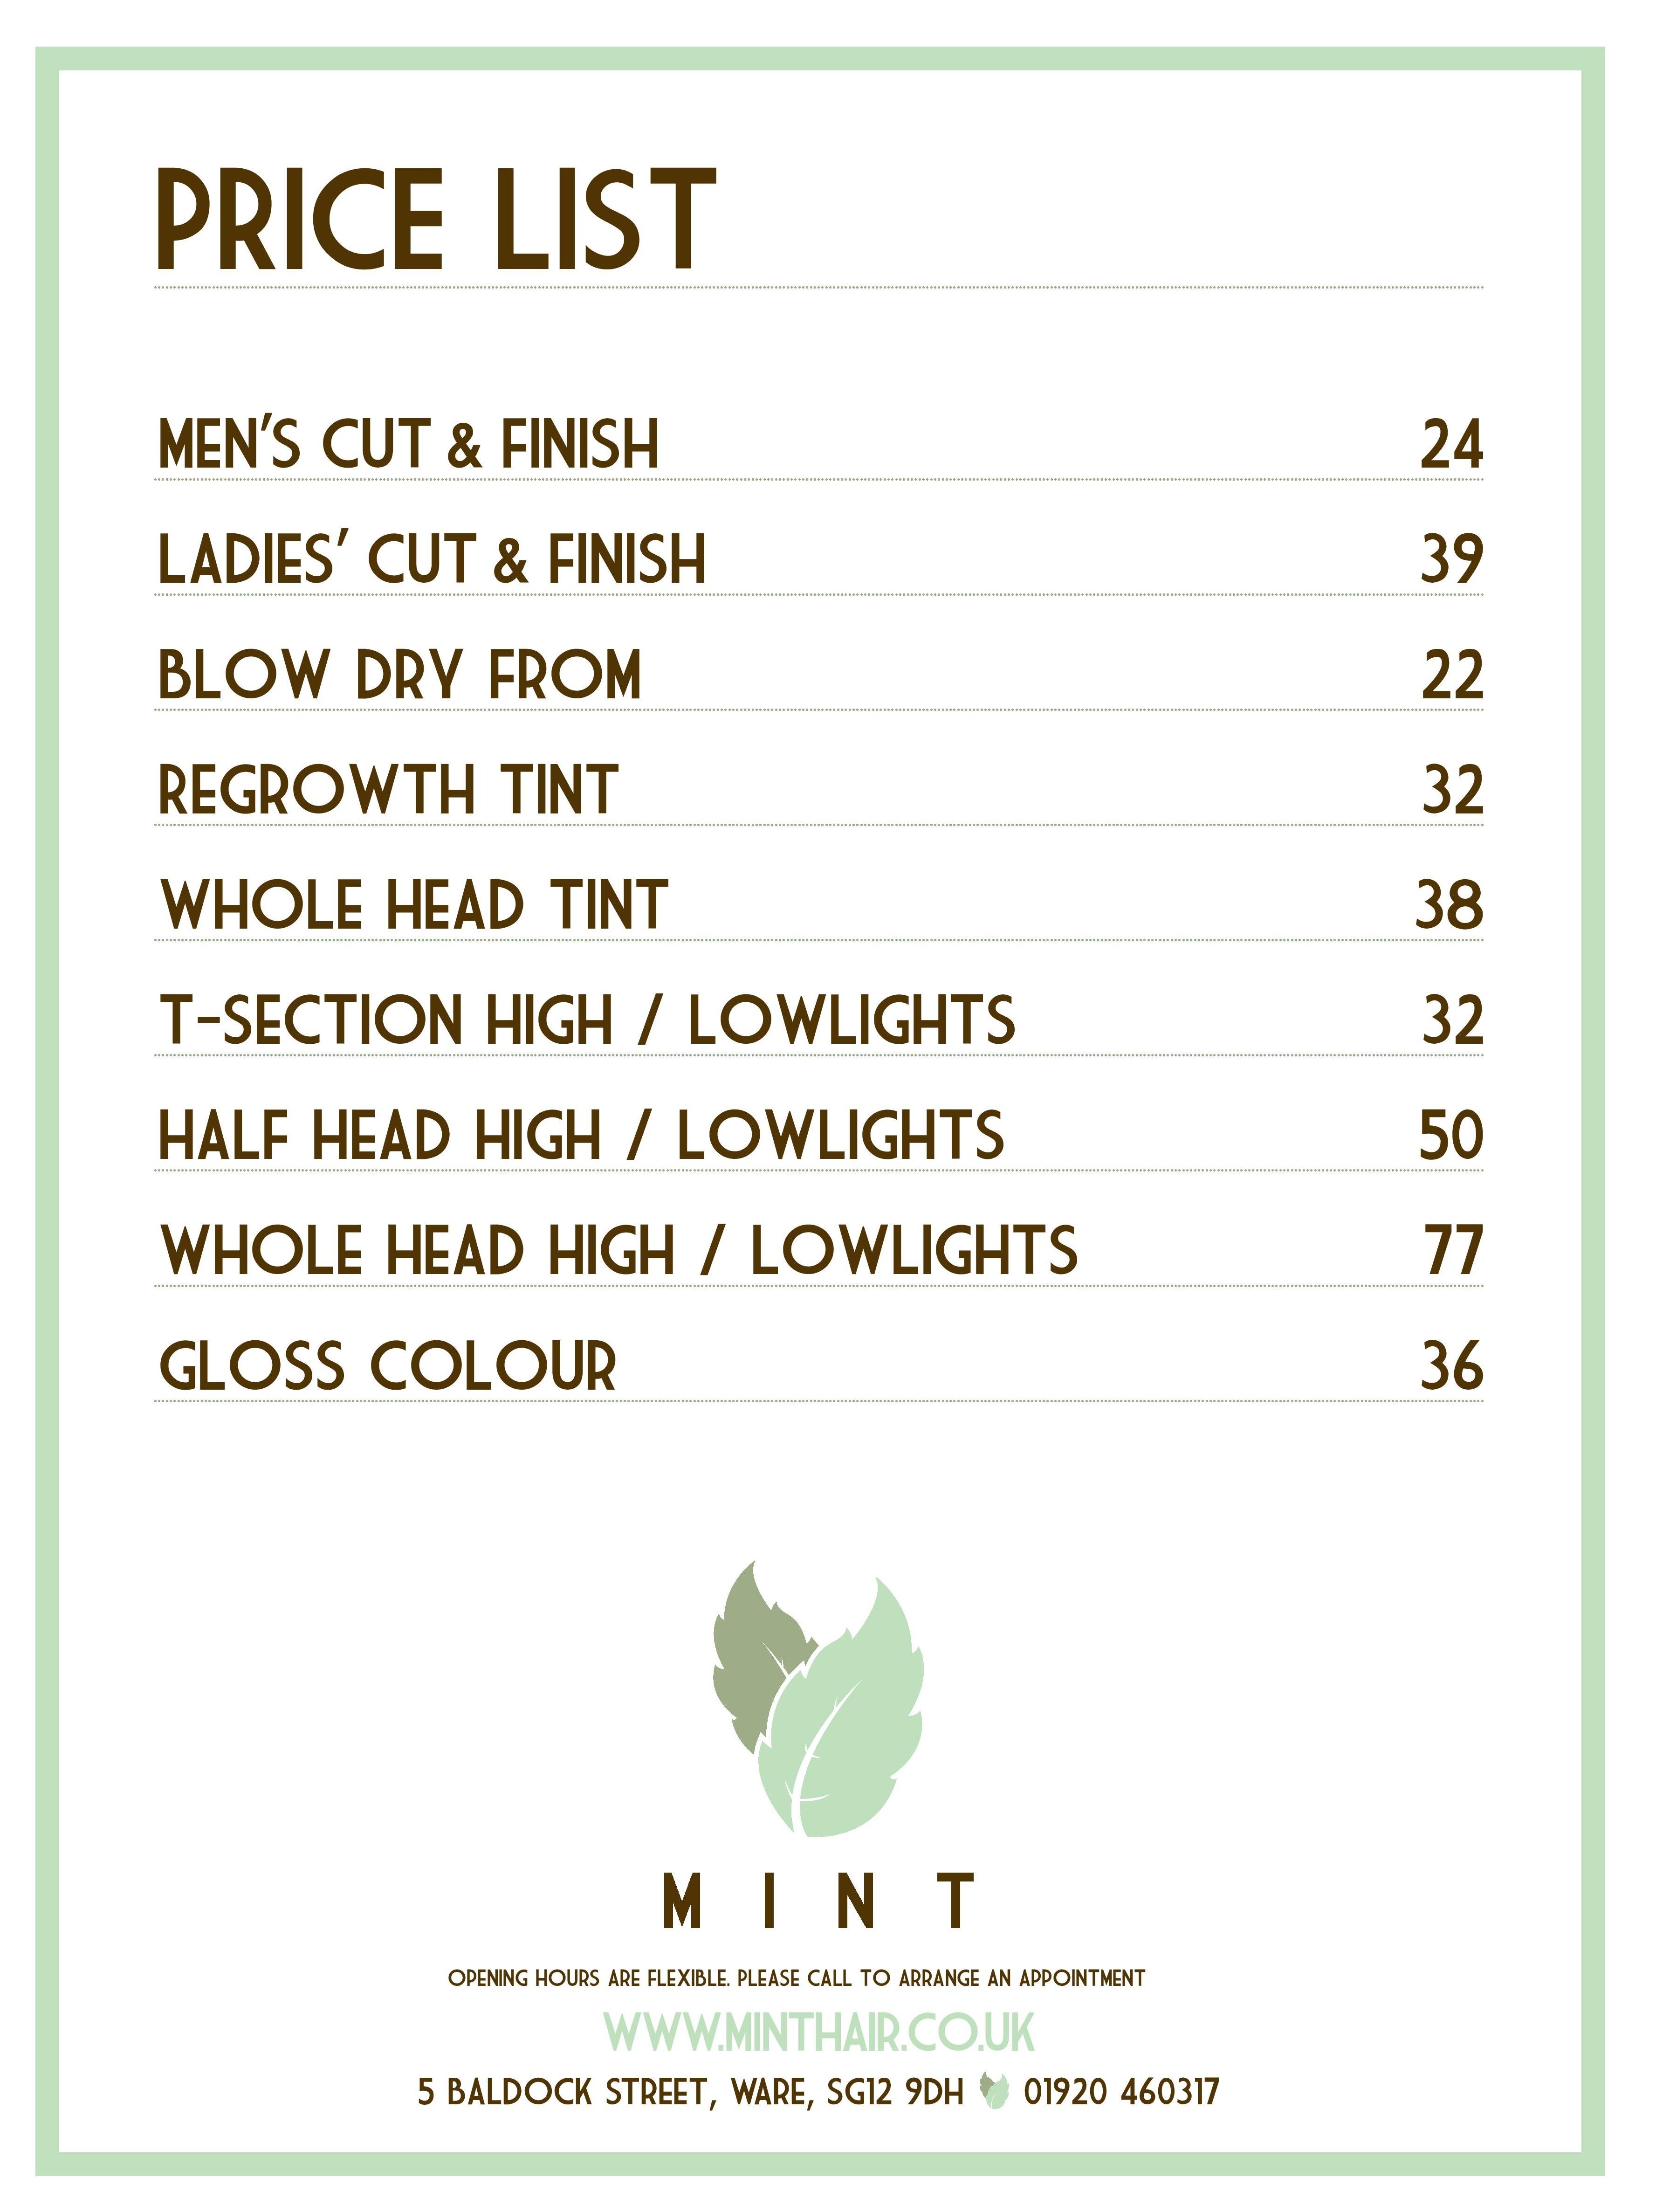 Mint Hair Salon Ware 01920 460317 5 Baldock Street